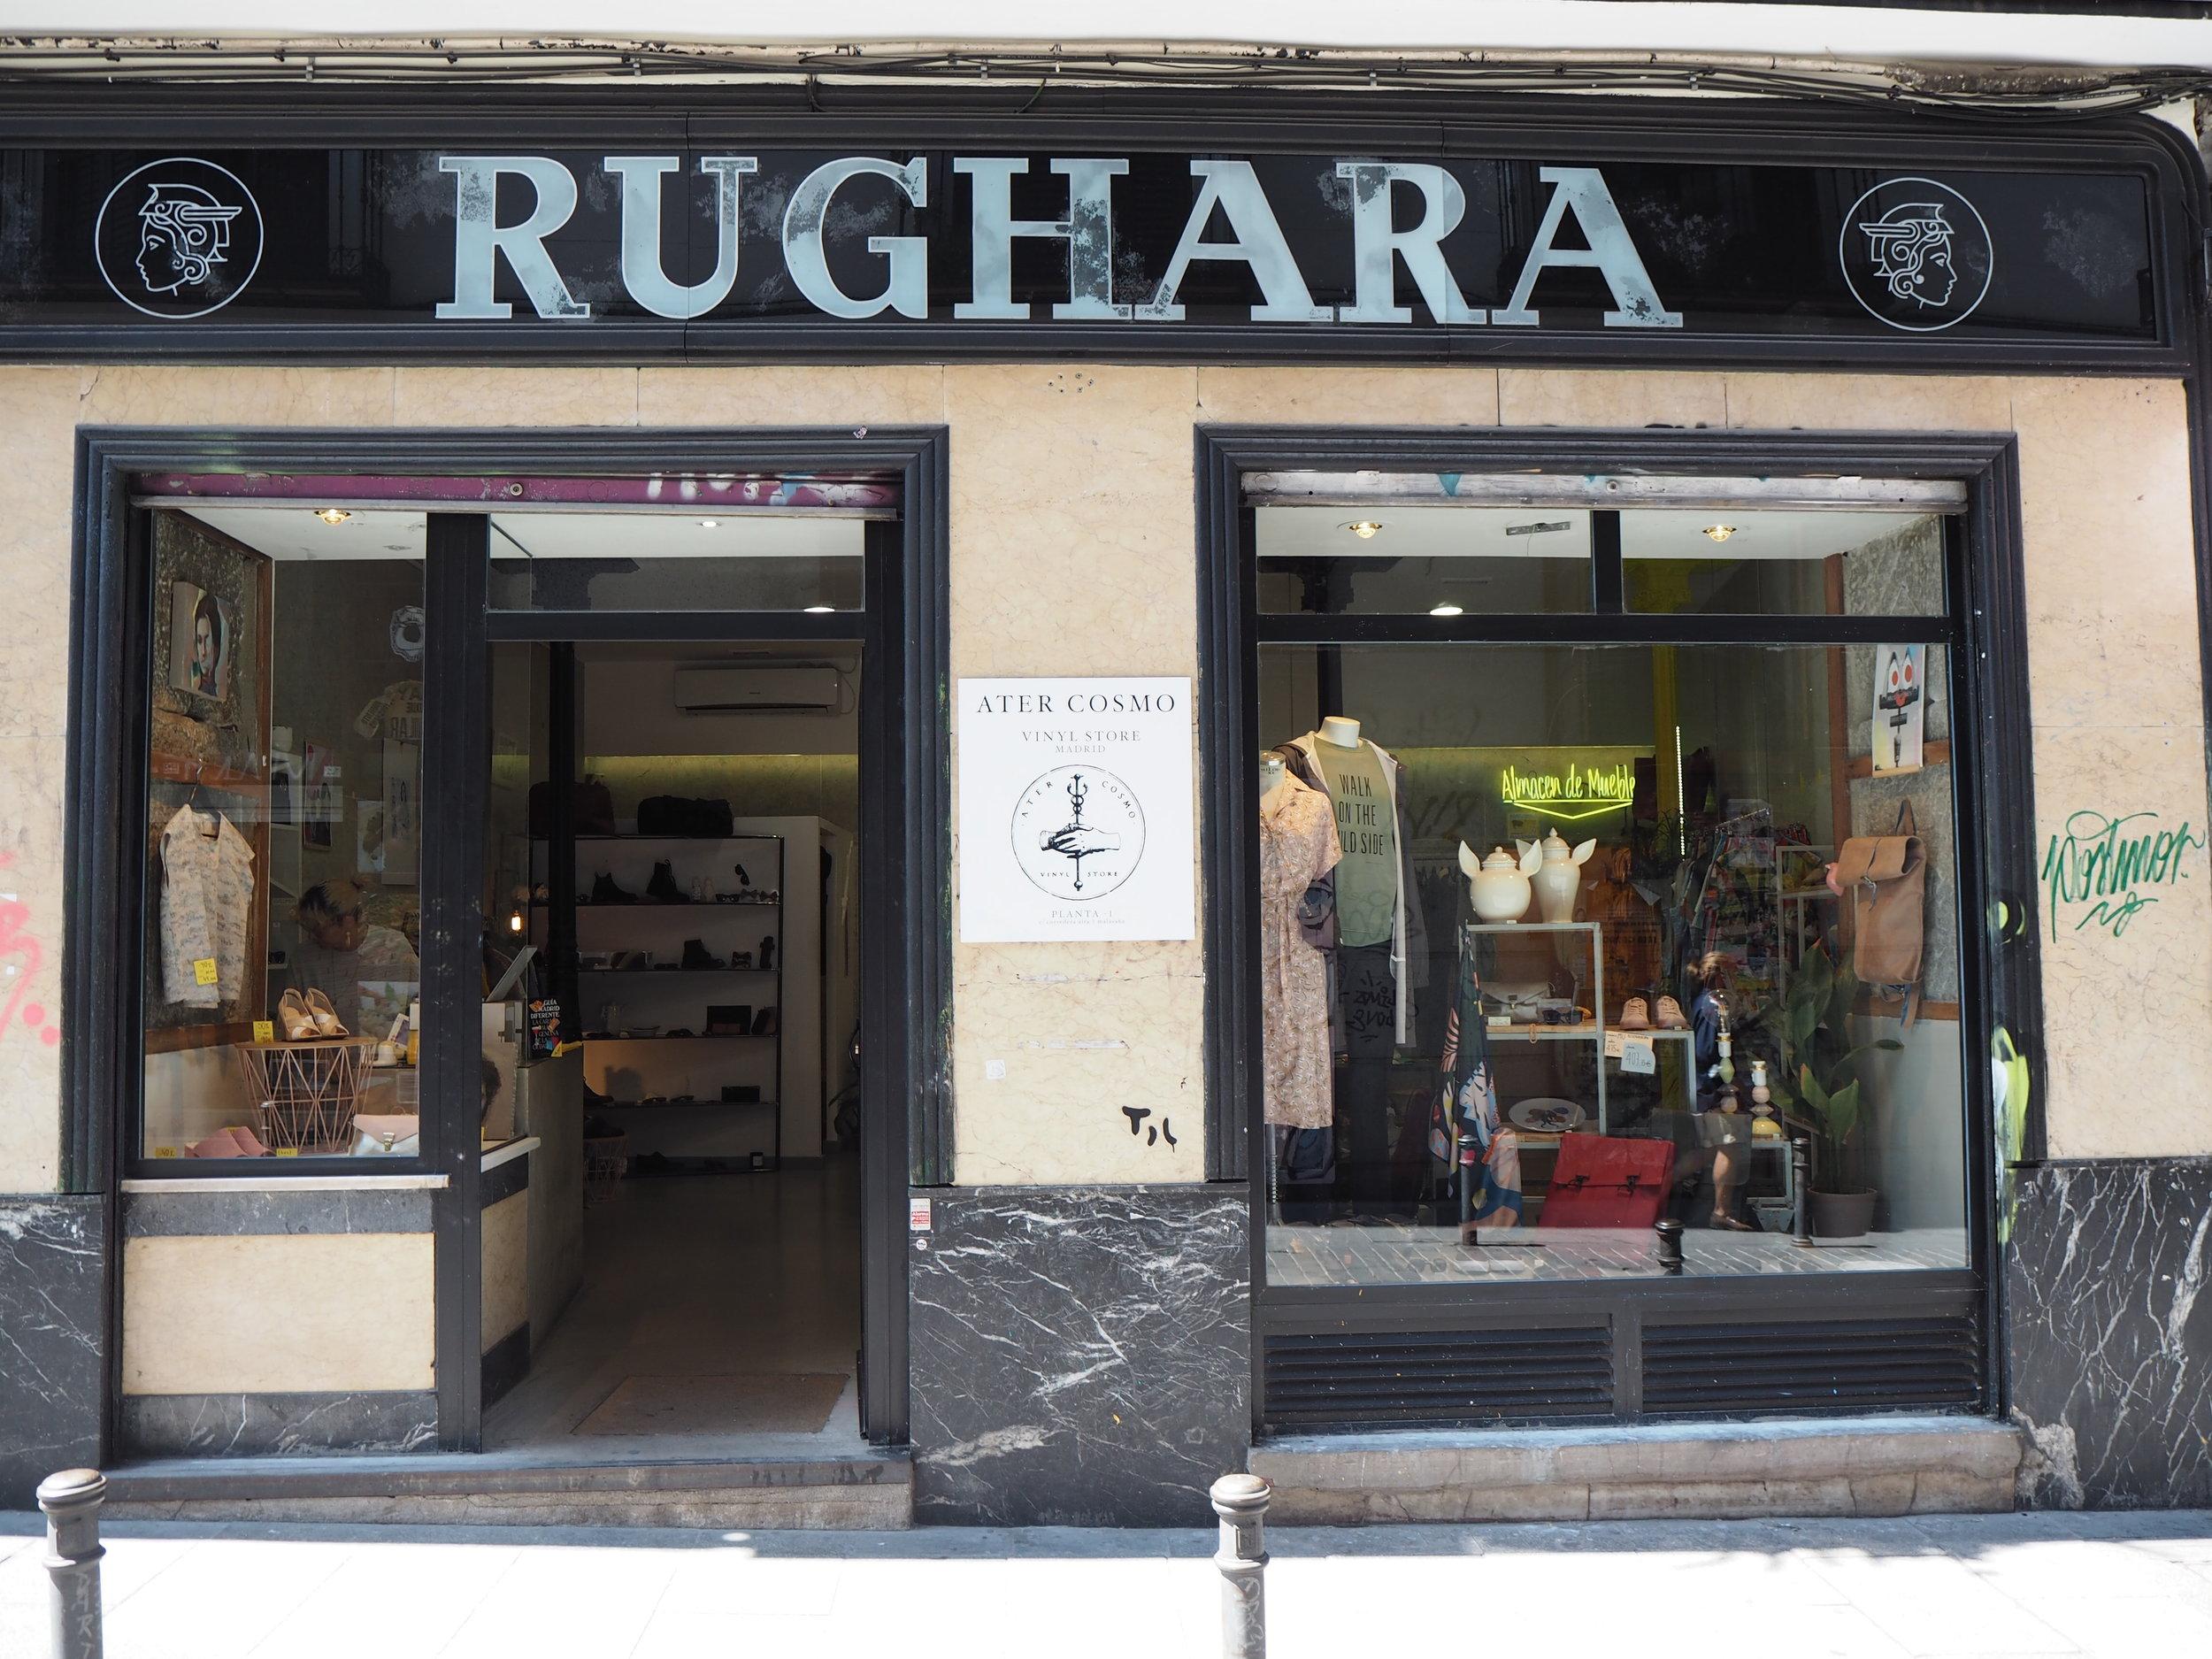 tiendas-ropa-madrid-originles-rughara-entrada.JPG